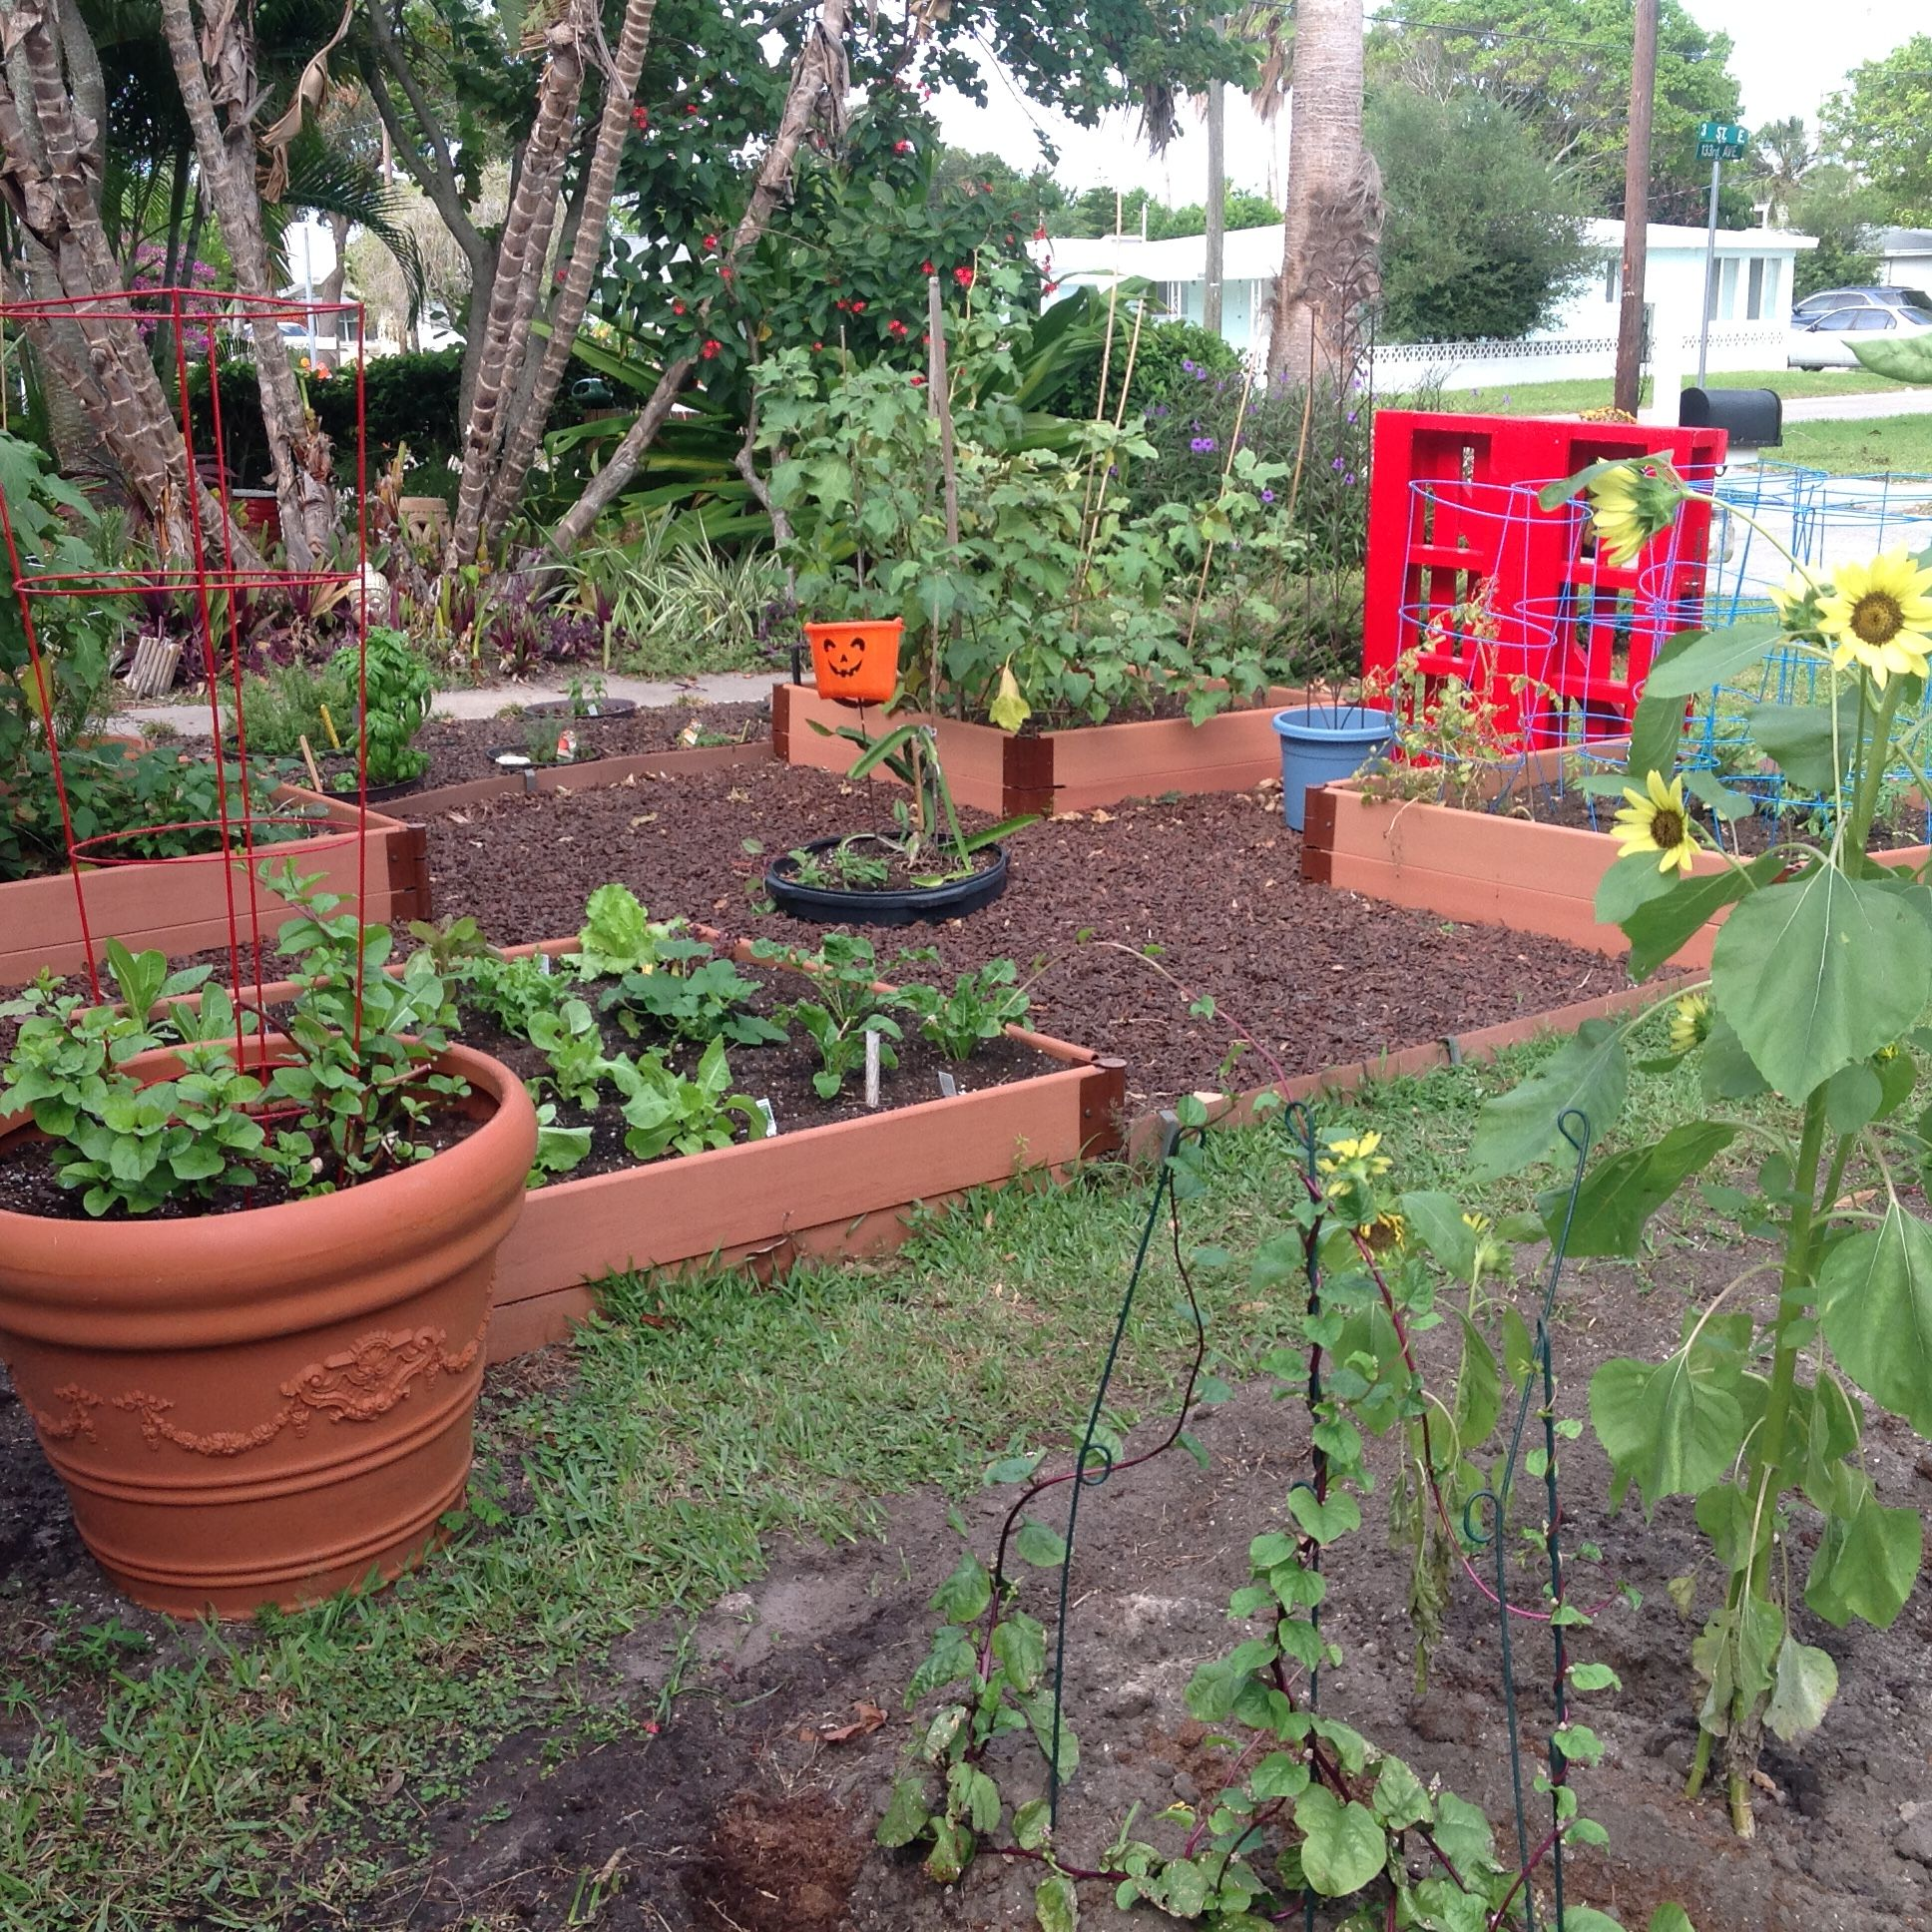 Best Vegetables For A Fall Garden: Fall Planting In Vegetable Garden.